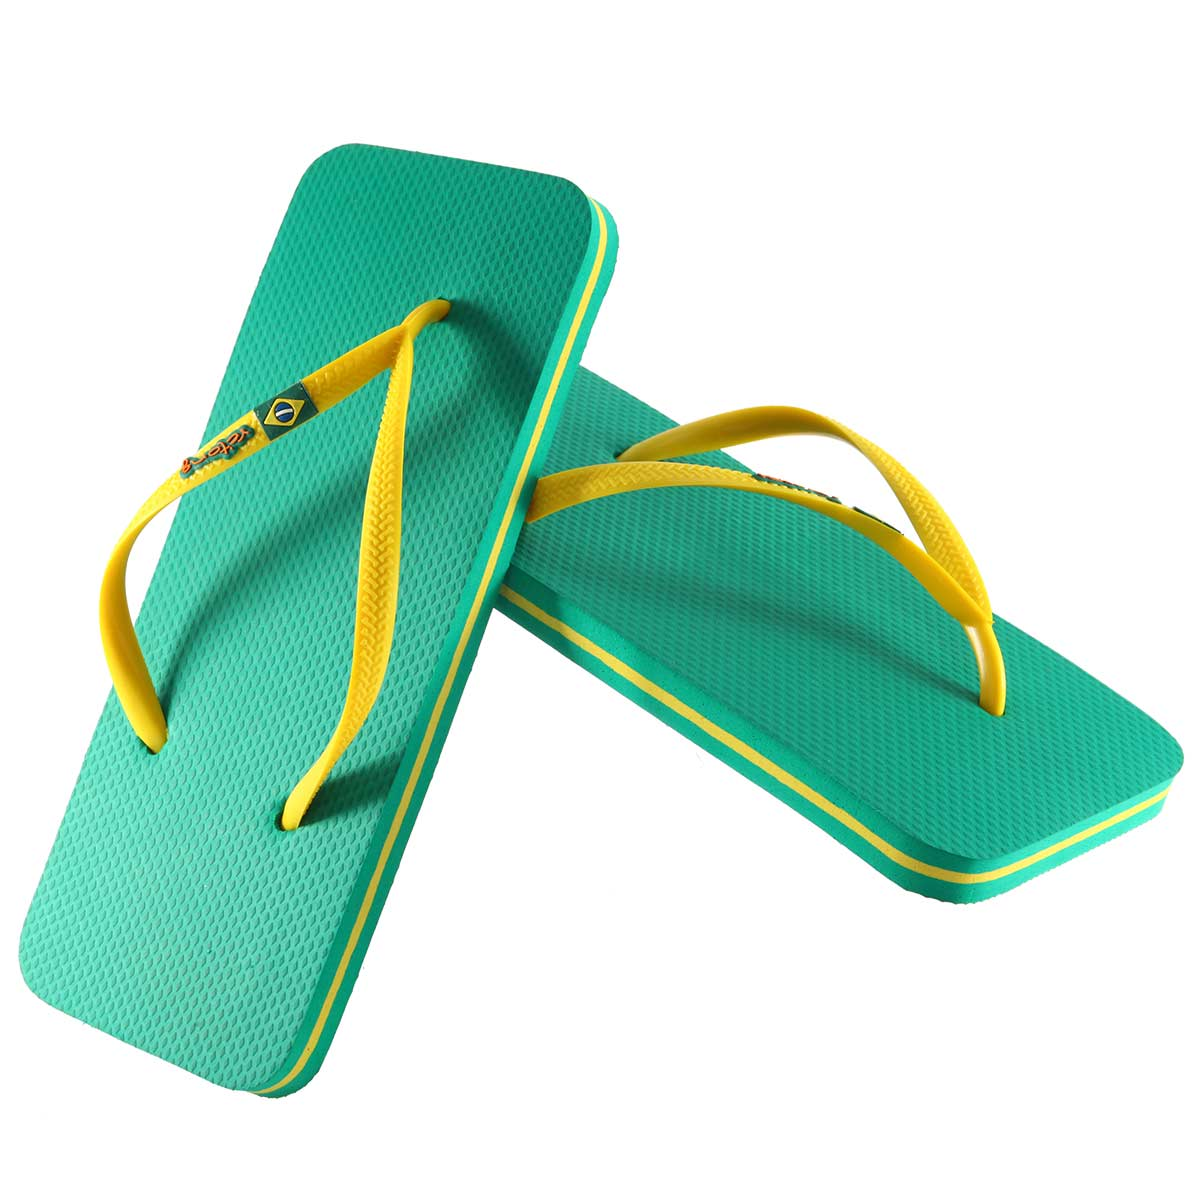 Chinelo Re'tong Quadrado Moda Style Slim 0003